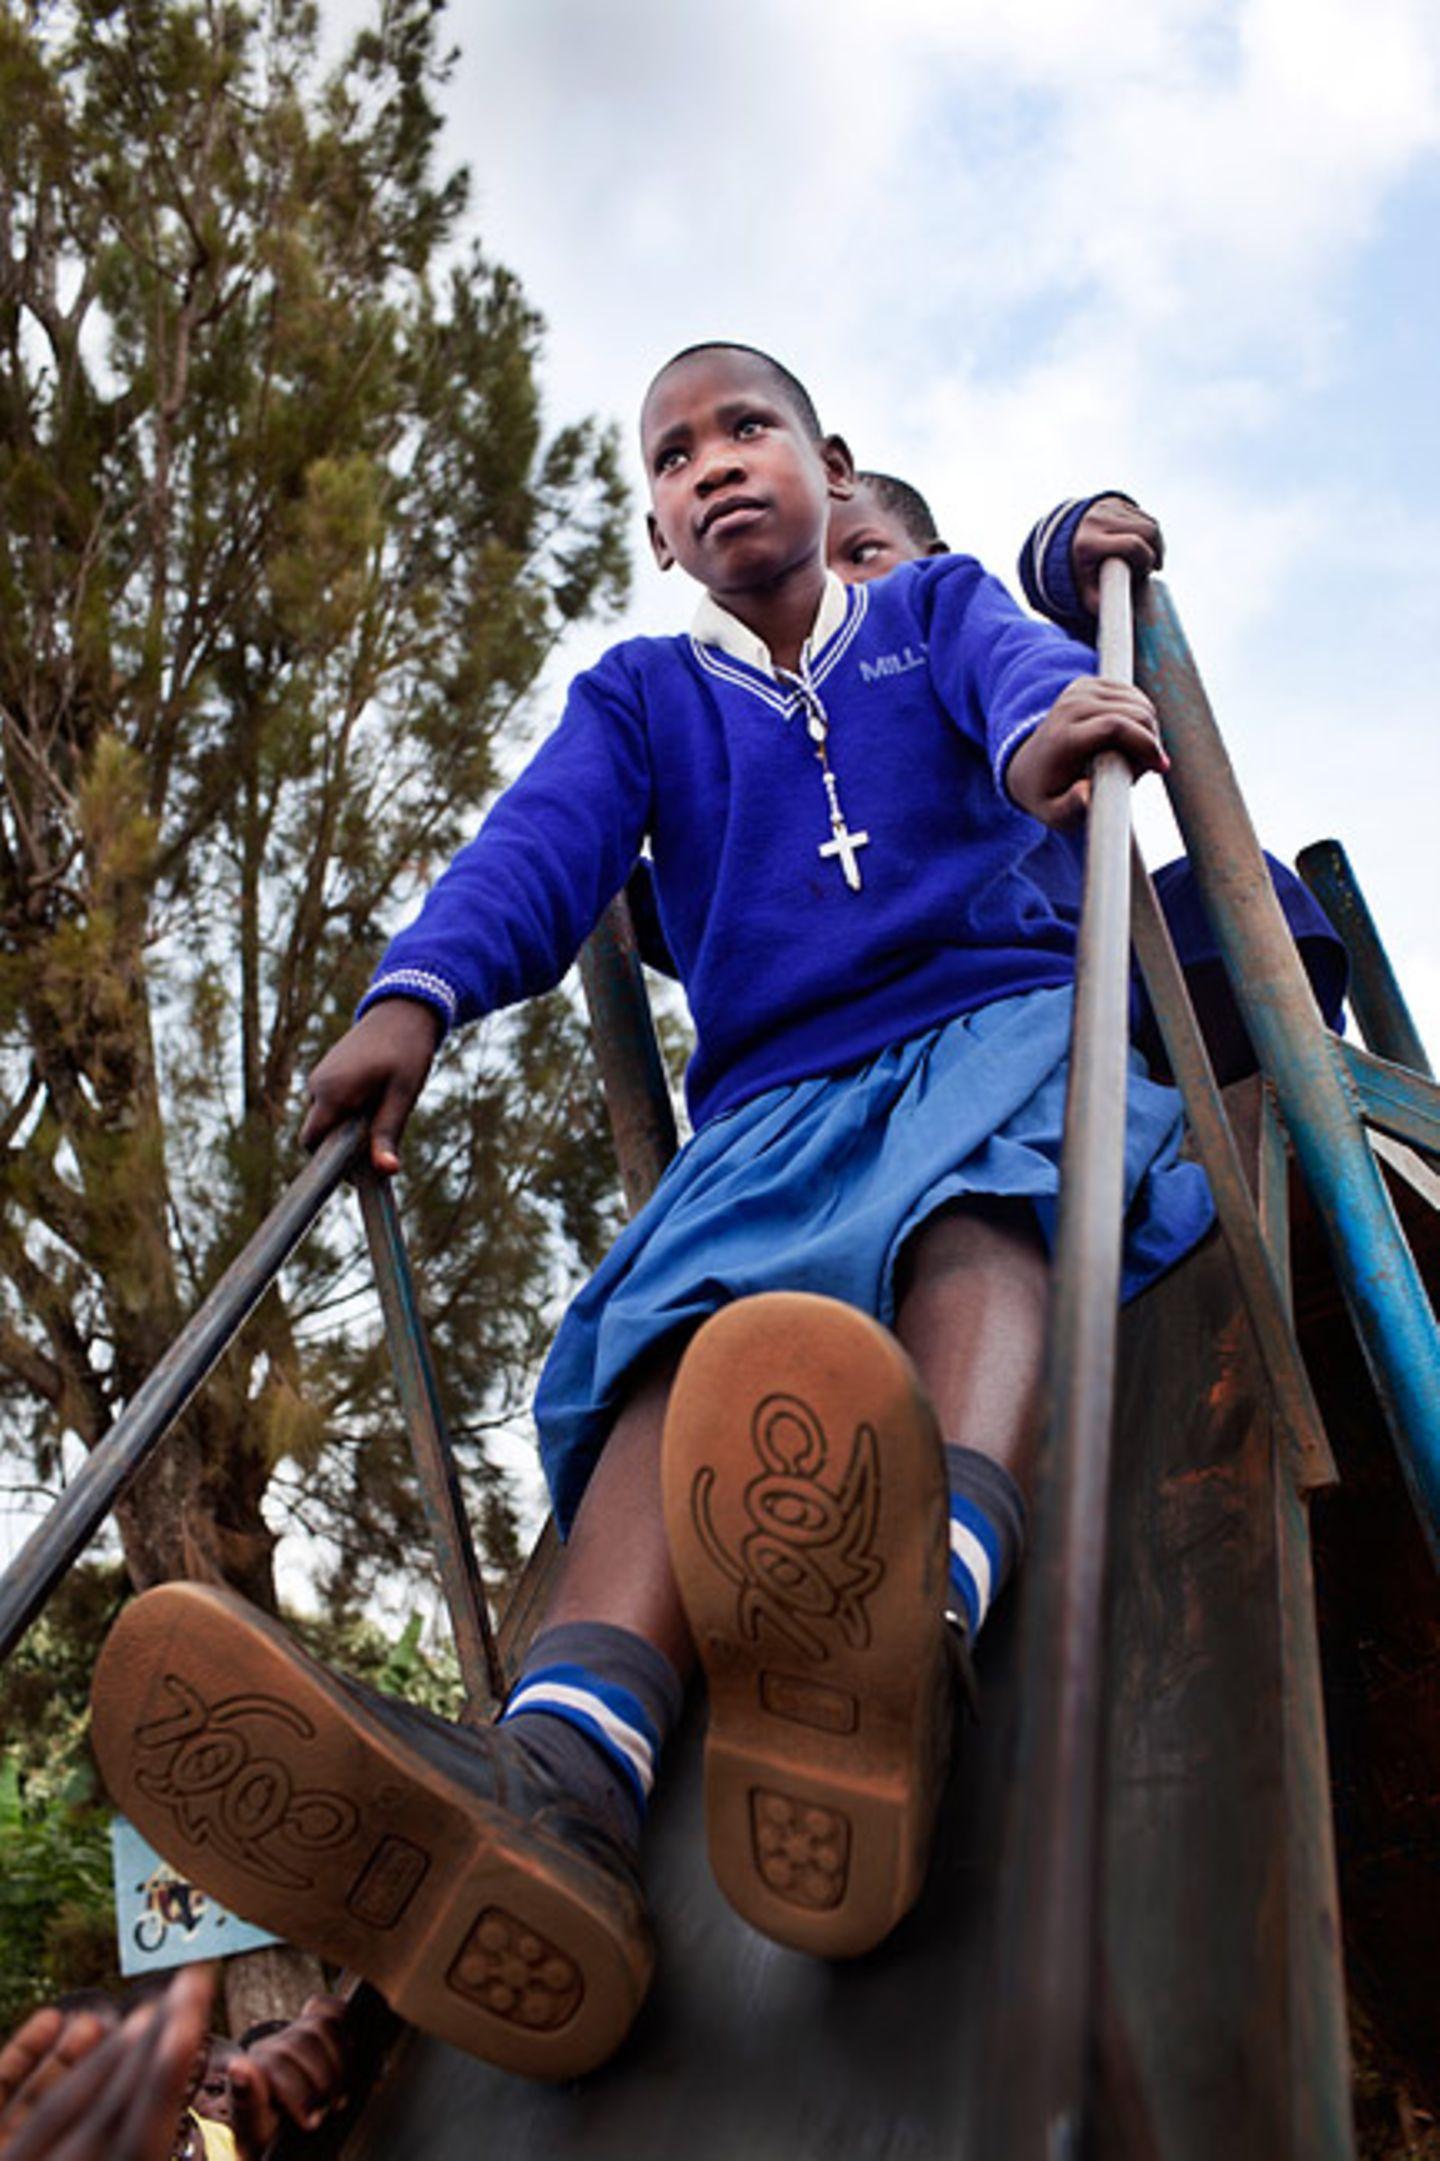 Fotostrecke: Unicef Uganda: Uganda: Victorias zweite Einschulung - Bild 5